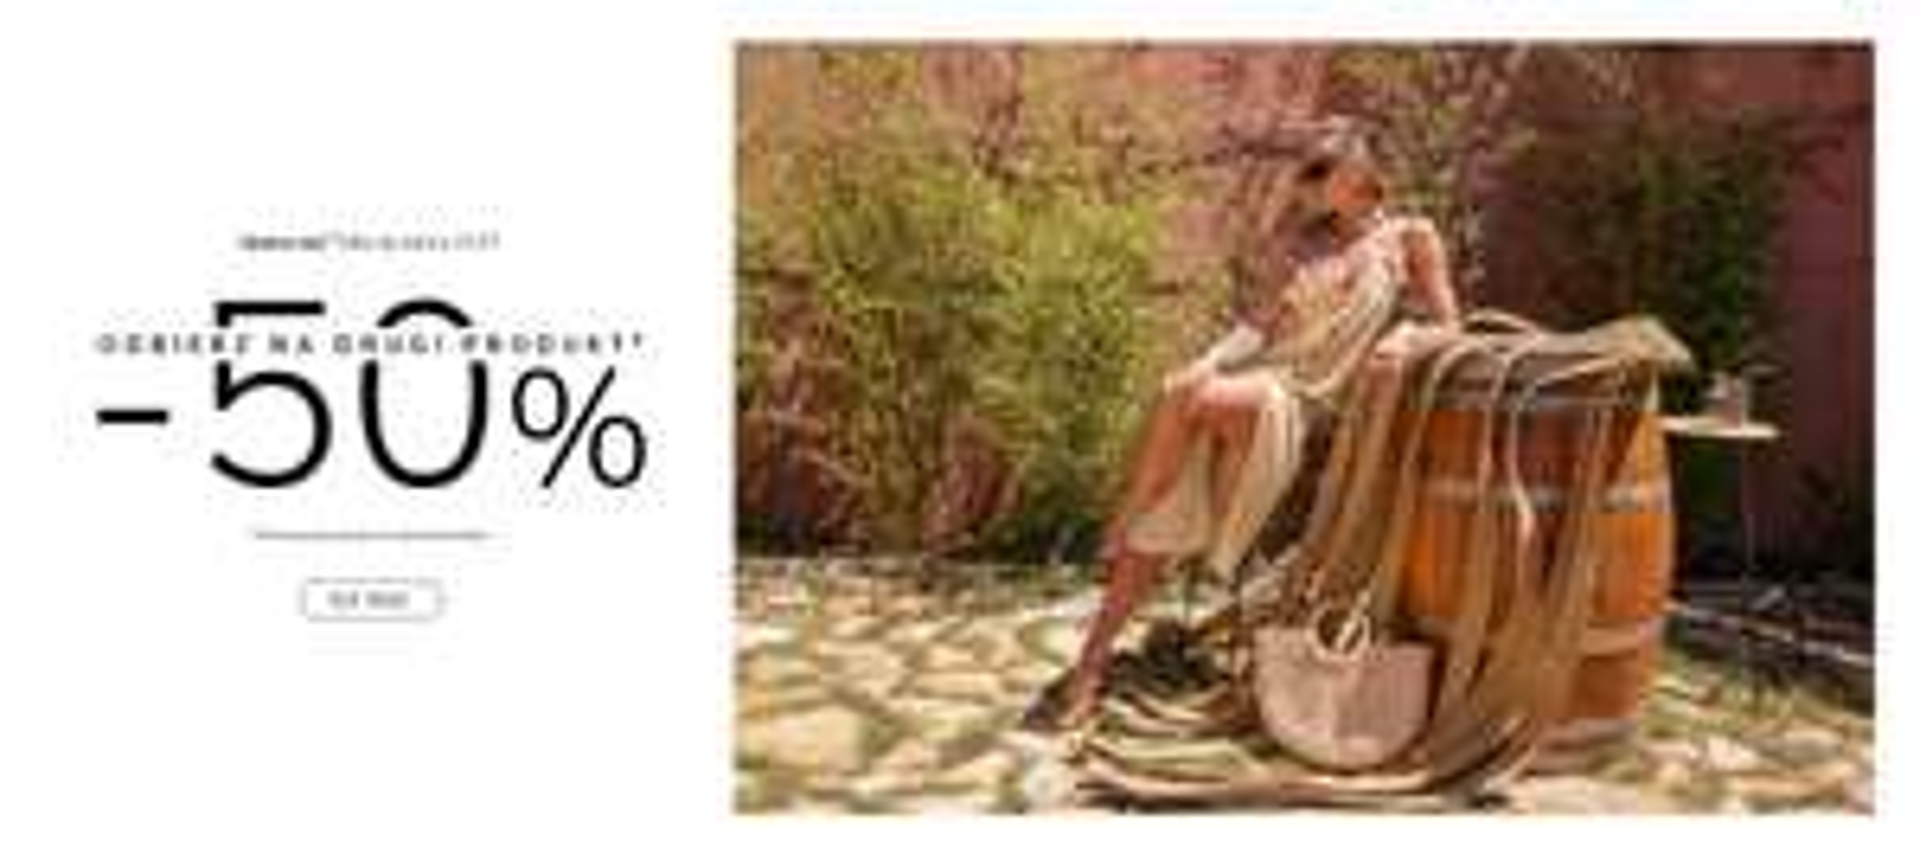 Renee: -50% na drugi produkt